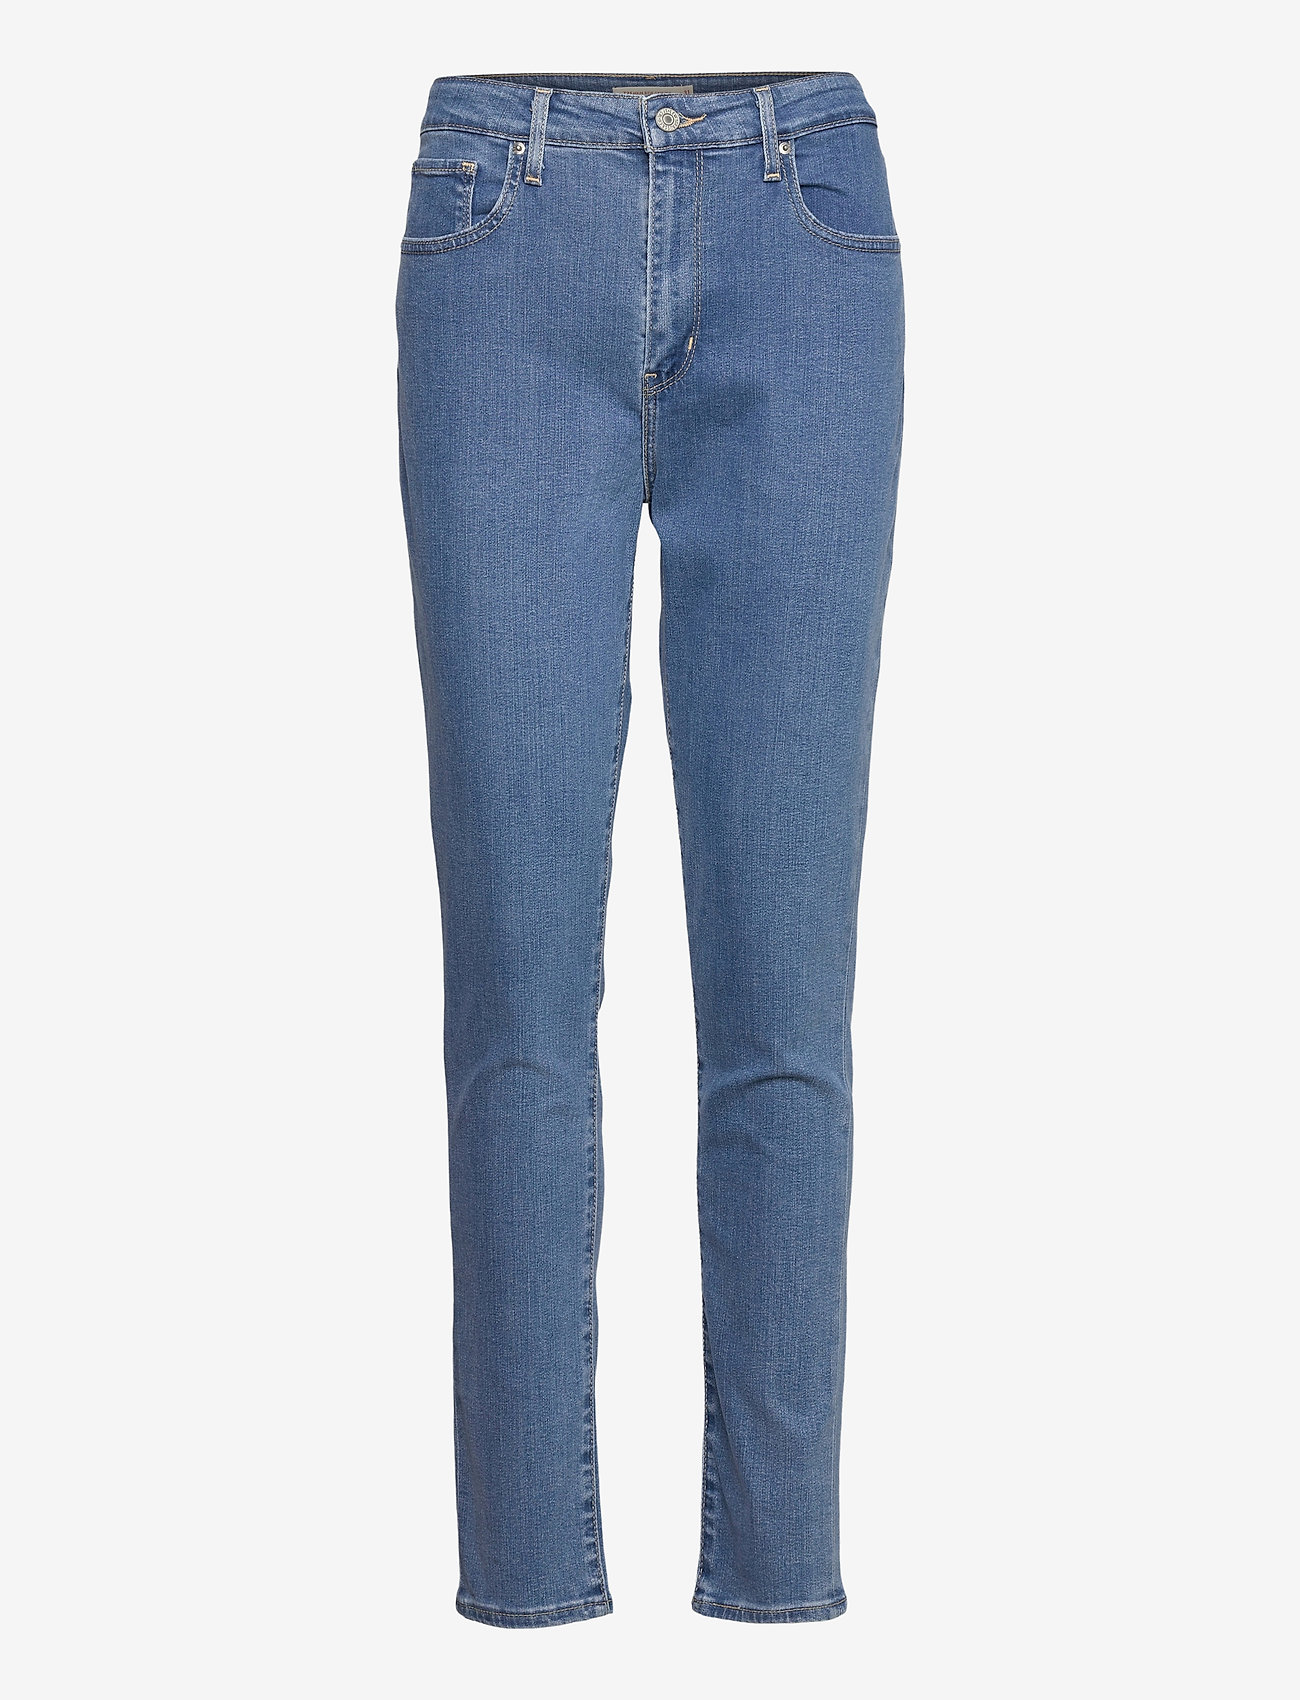 LEVI´S Women - 721 HIGH RISE SKINNY BOGOTA LI - skinny jeans - dark indigo - flat finish - 1